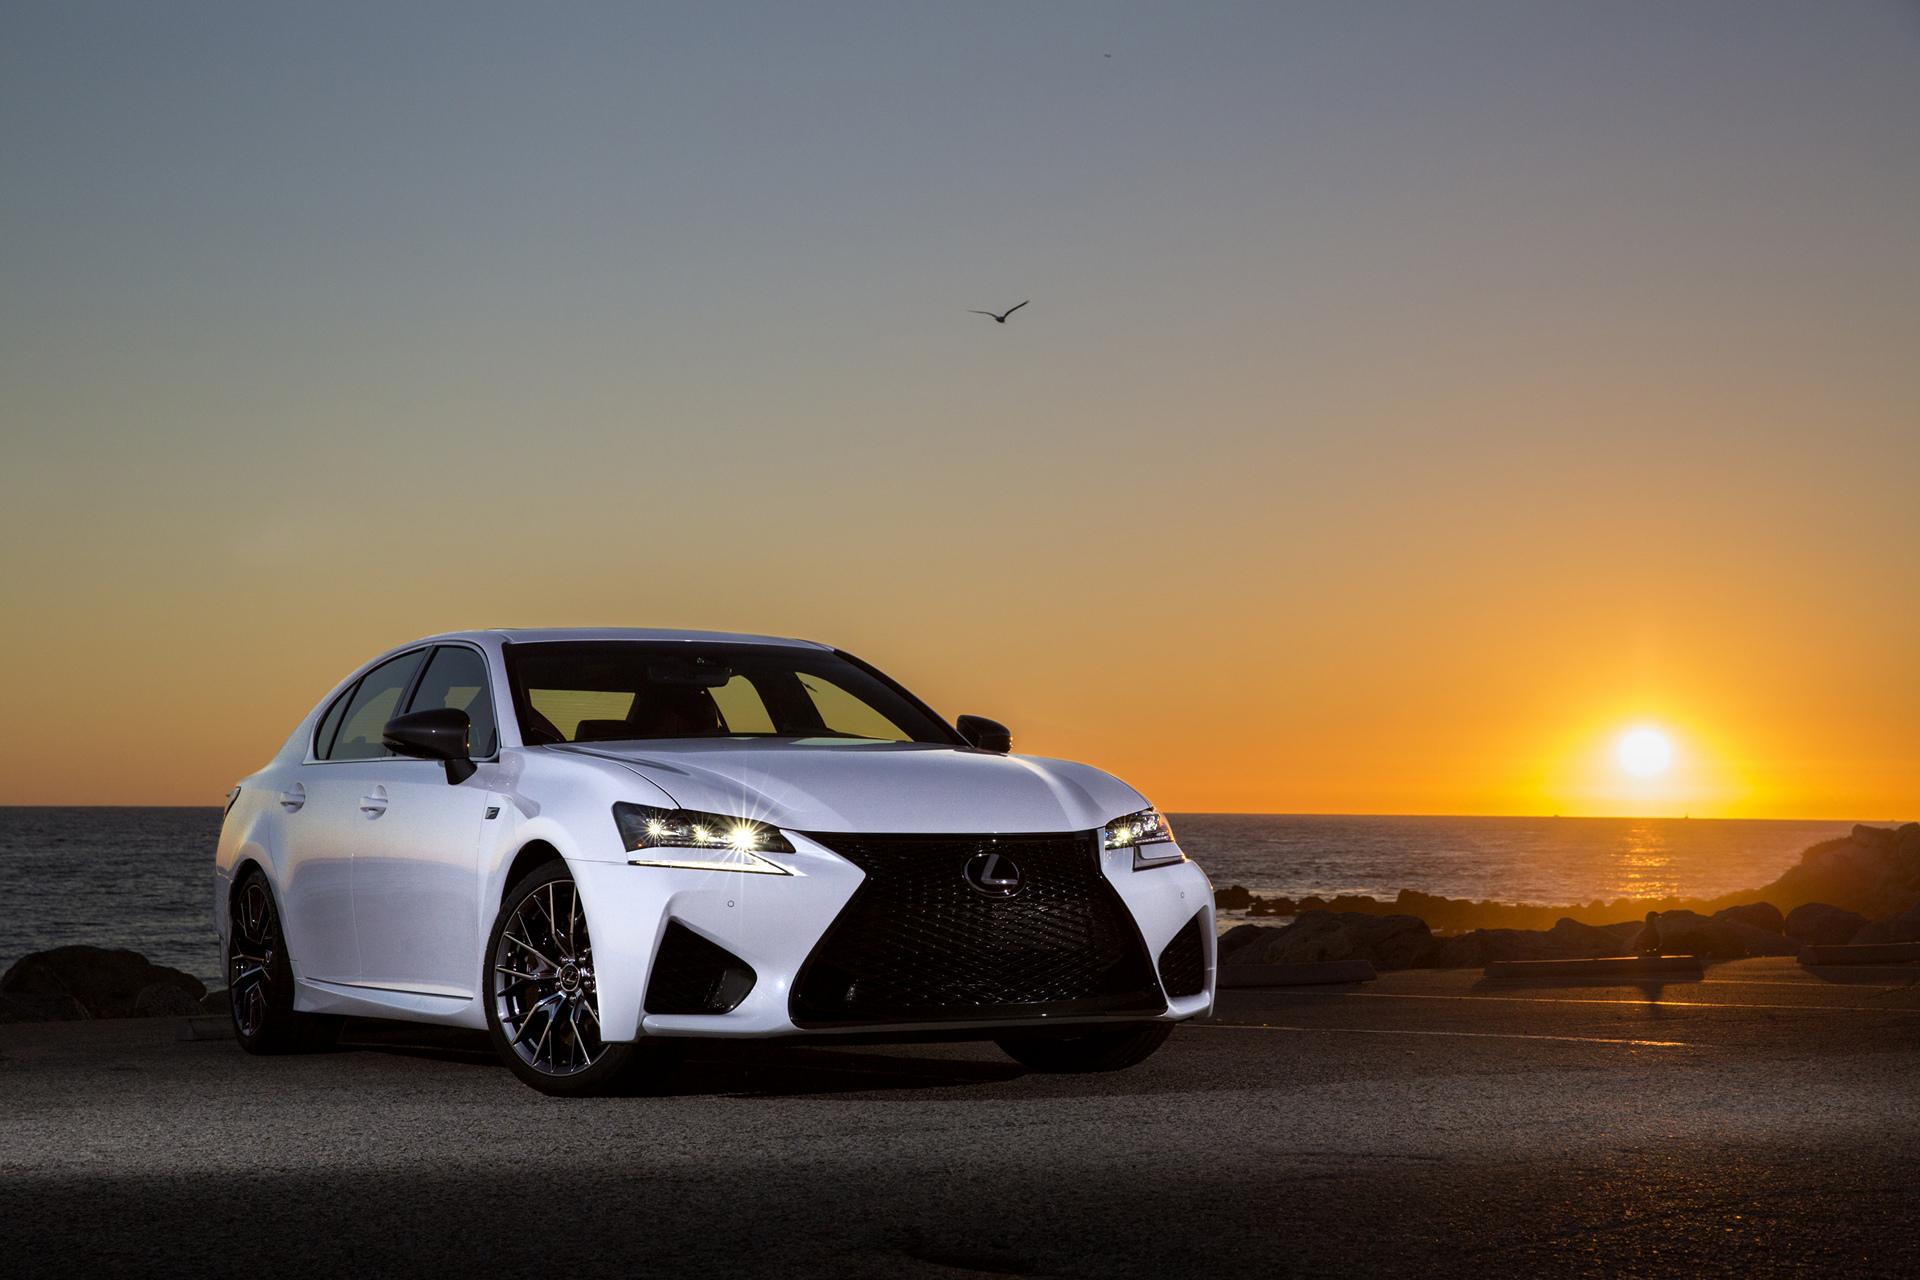 2016 Lexus GS F © Toyota Motor Corporation